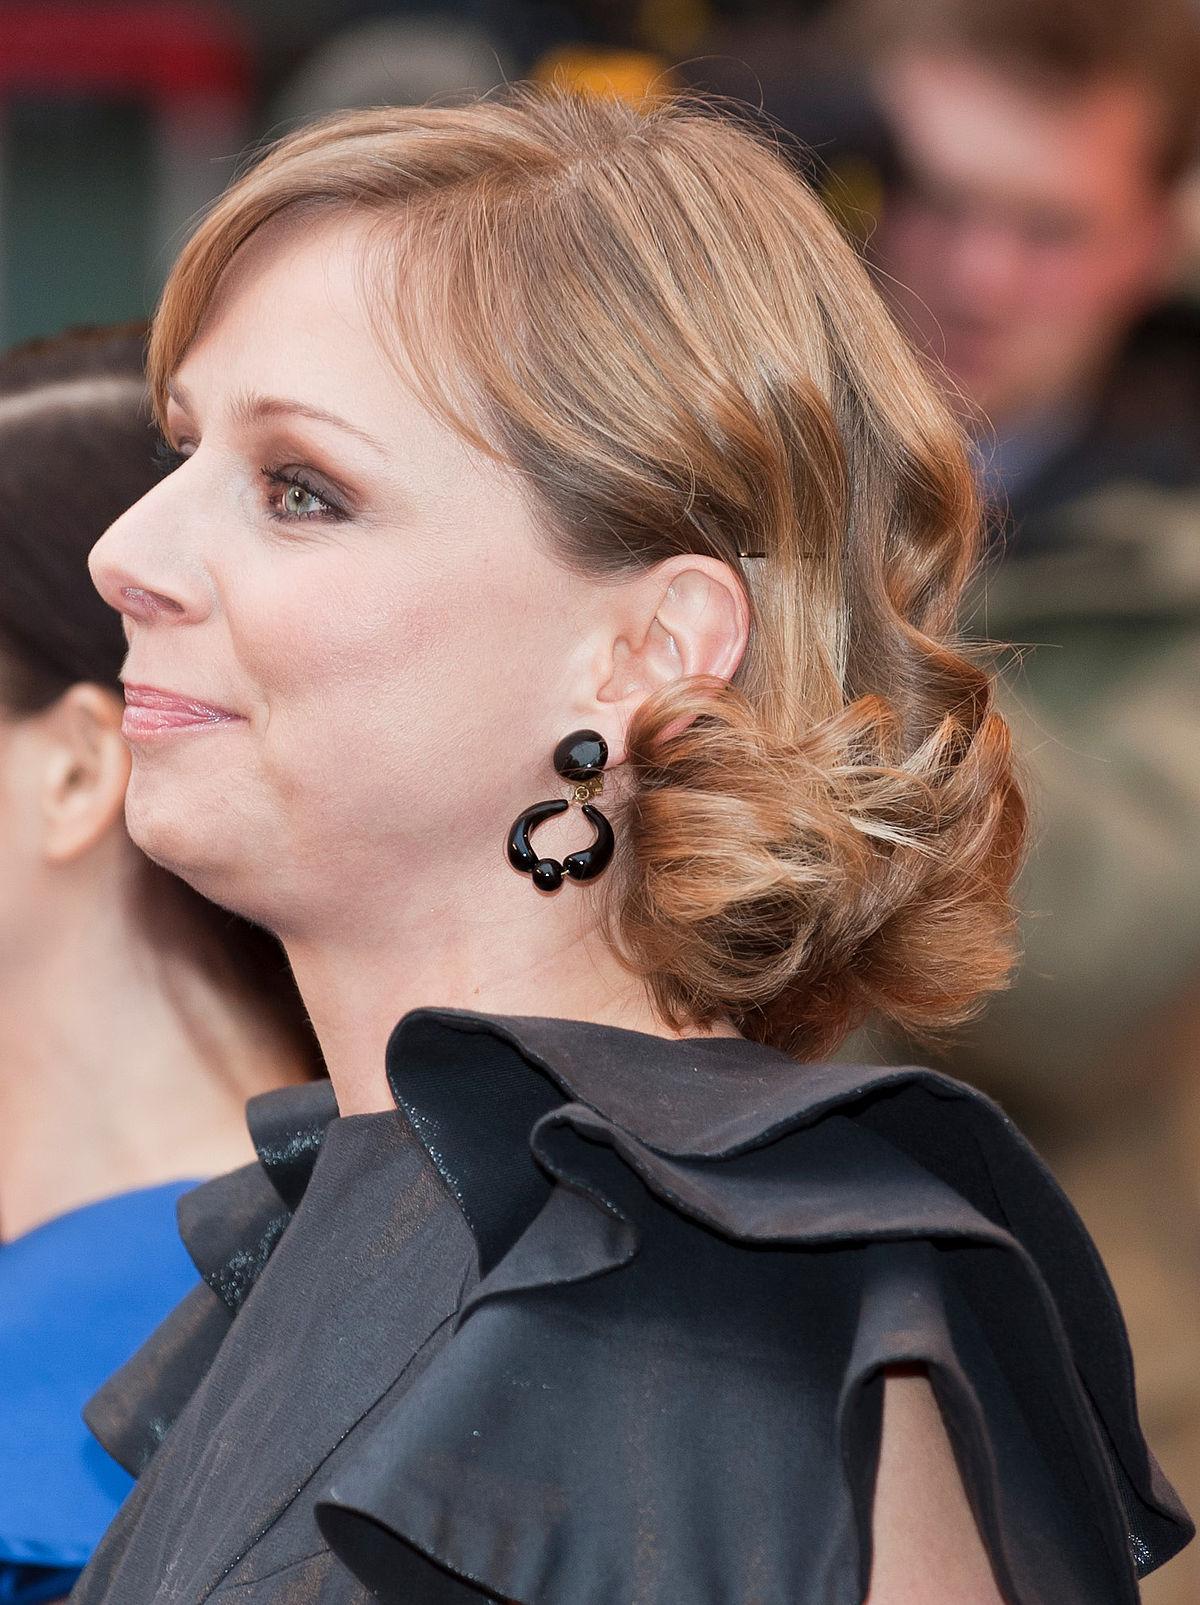 Kvindelige skuespillere danske